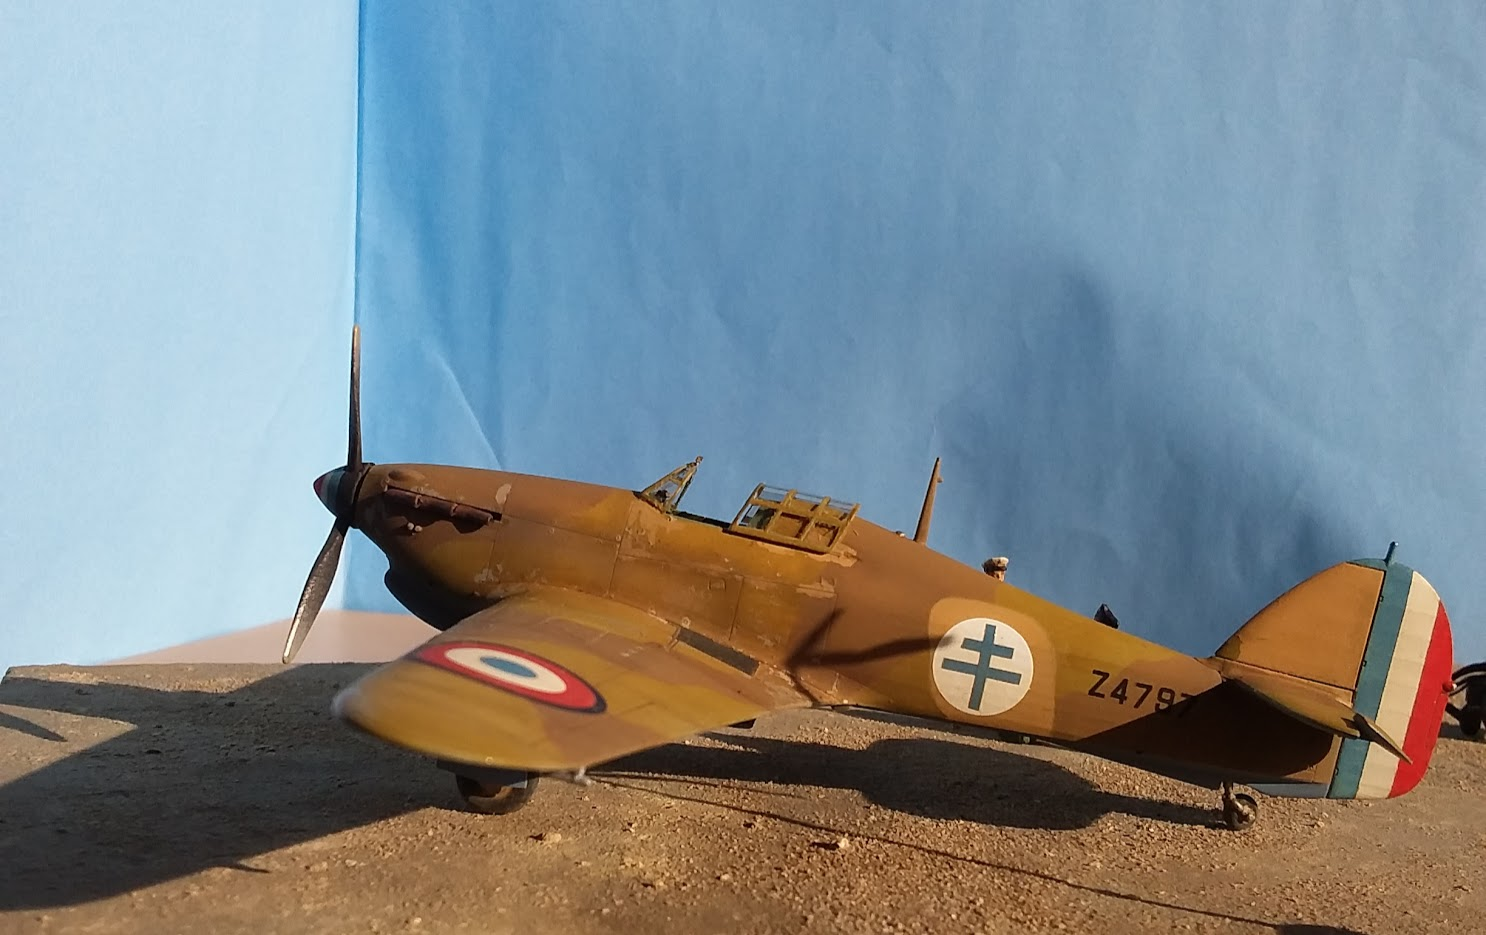 [Armahobby] Hawker Hurricane MkI ACtC-3d2oRTBzxi5NyLh5oH0GfM1YcsaBlBUKMdSDH4Do44J-E1_RkfXHCLv6O-84N6AO5IhcuUu8oSjXQ5zJqzlw8CzUm87NYrl75MUy2qg17wmsksKGK_PB68tEnbtxzZBbhfcW8Bqi-tHzoZS6_hQriVuhg=w1487-h936-no?authuser=0